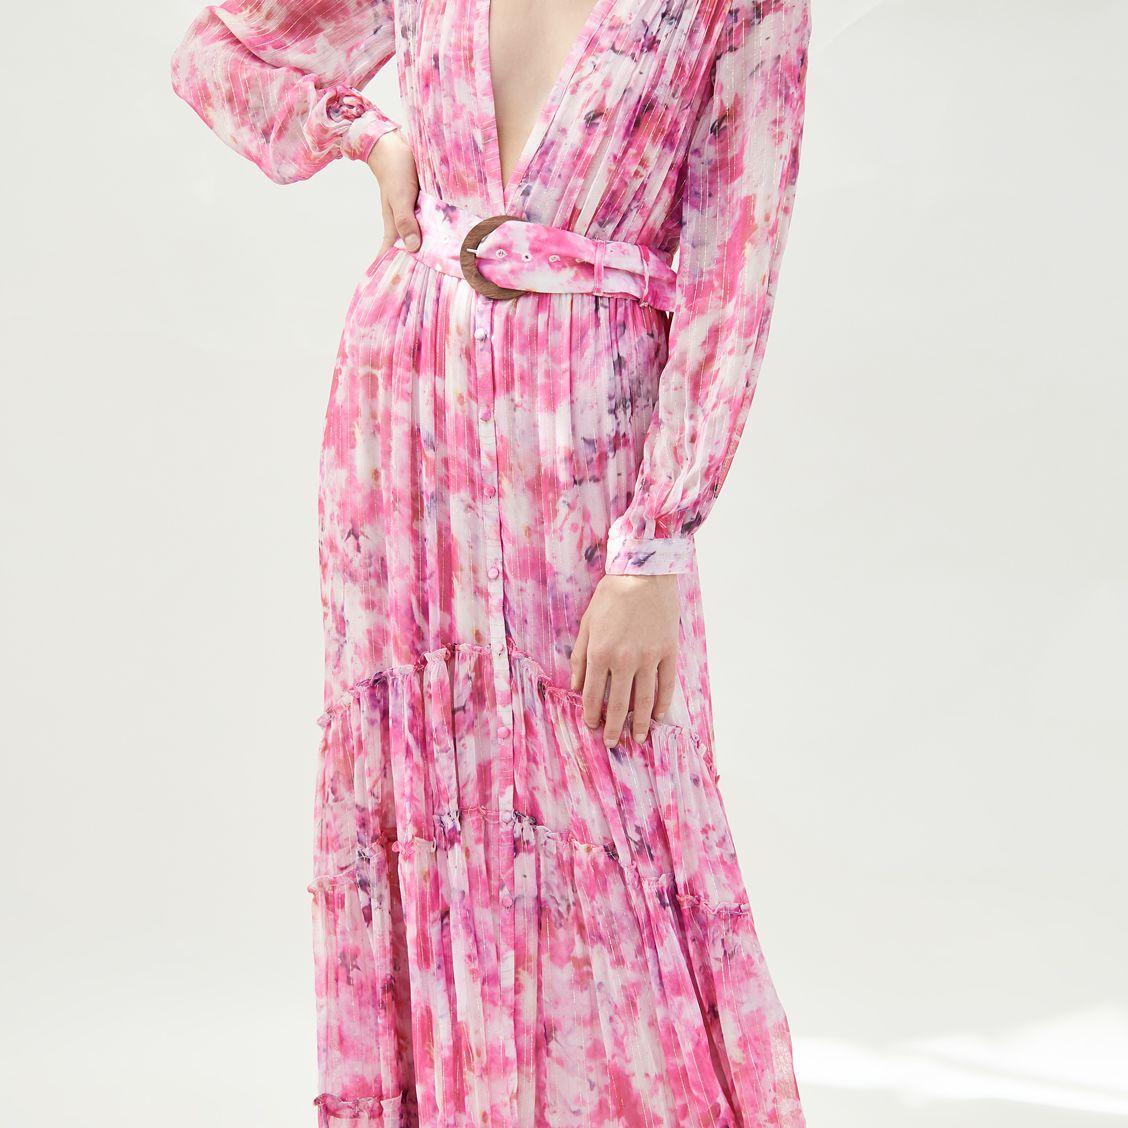 ROCOCO SAND Long Dress, $480